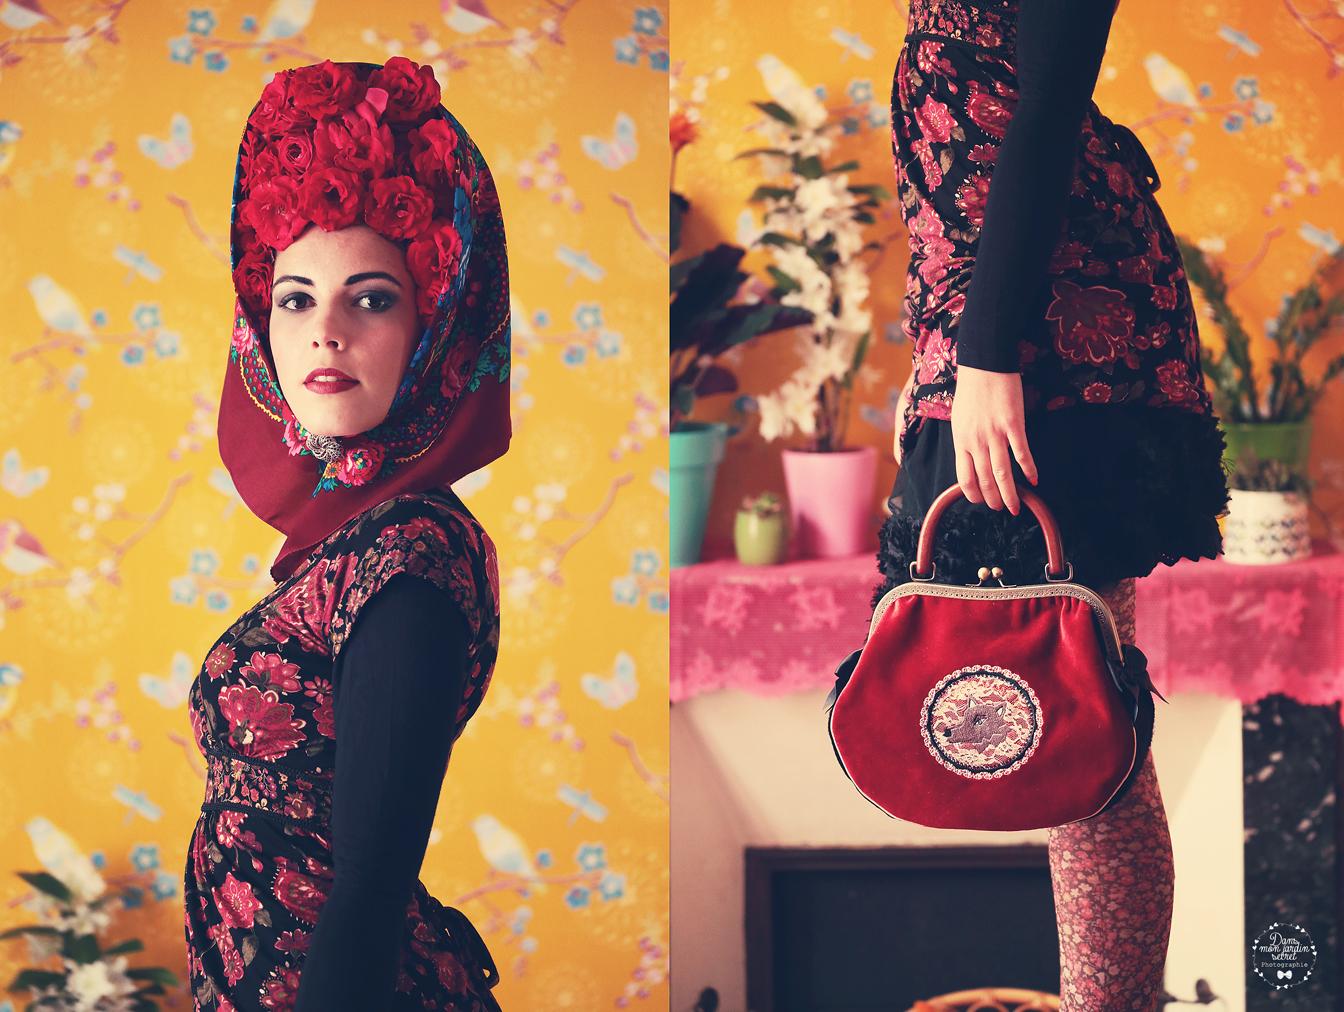 sac rétro bohème chaperon rouge gypsy